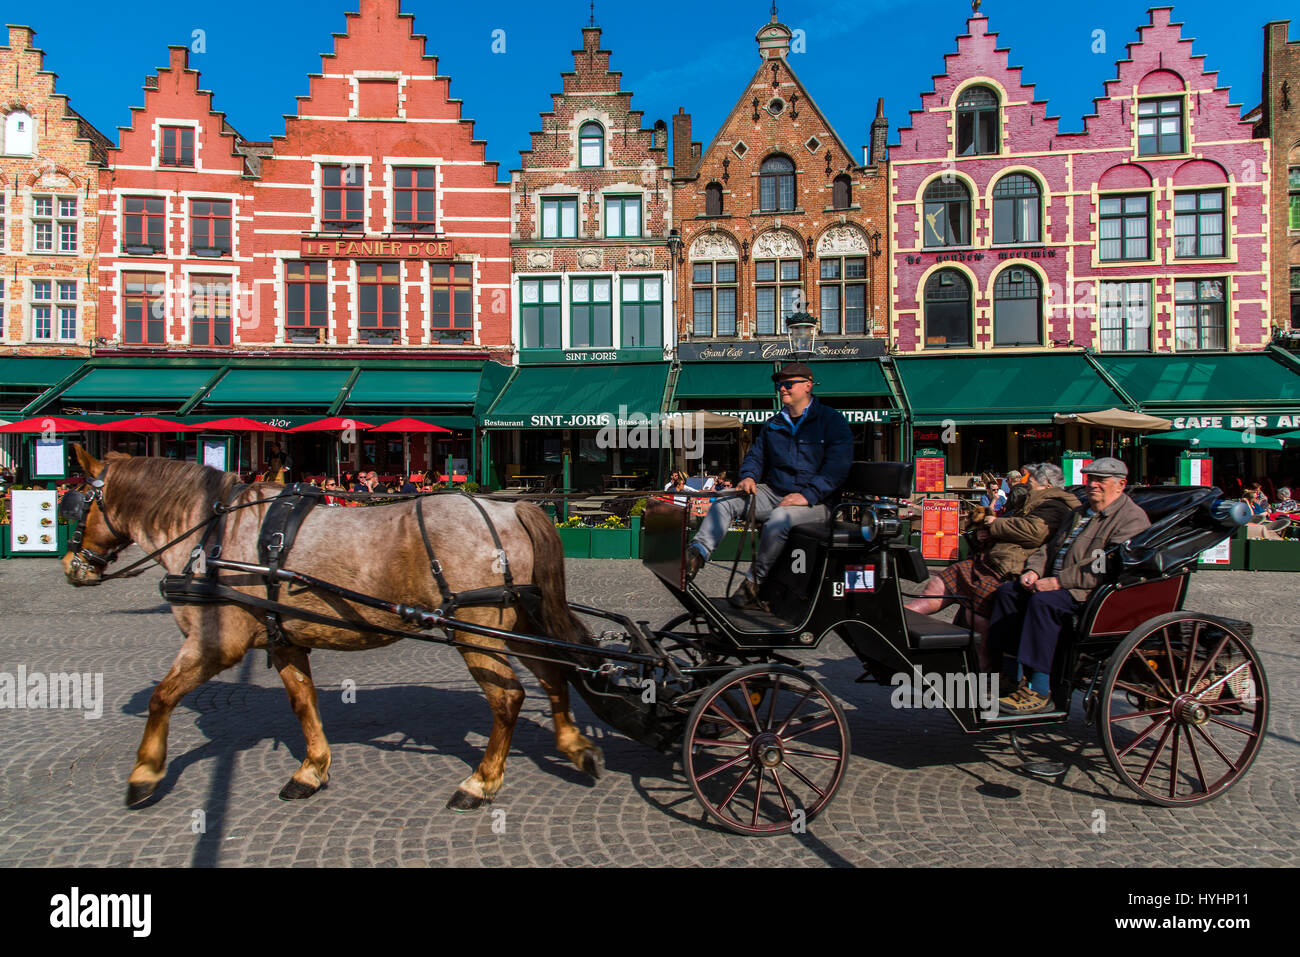 Horse carriage in Markt or Market Square, Bruges, West Flanders, Belgium - Stock Image